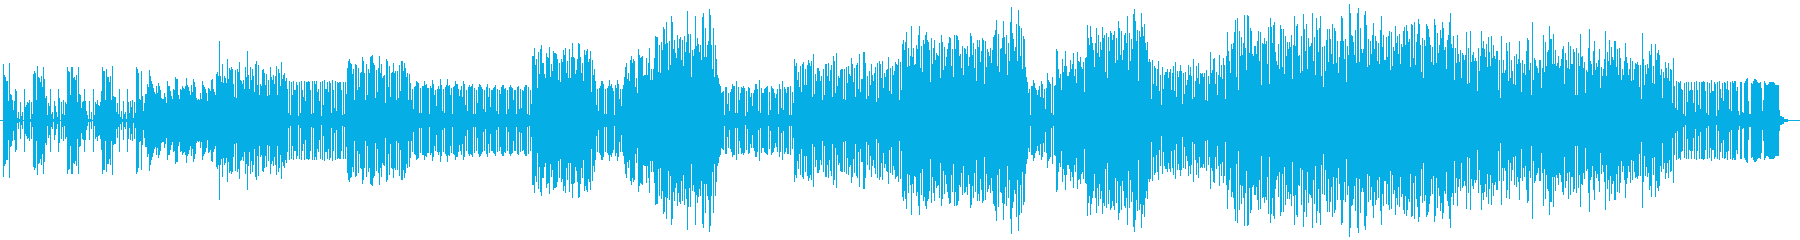 Jupitar-8の低音で延々七拍子の再生済みの波形